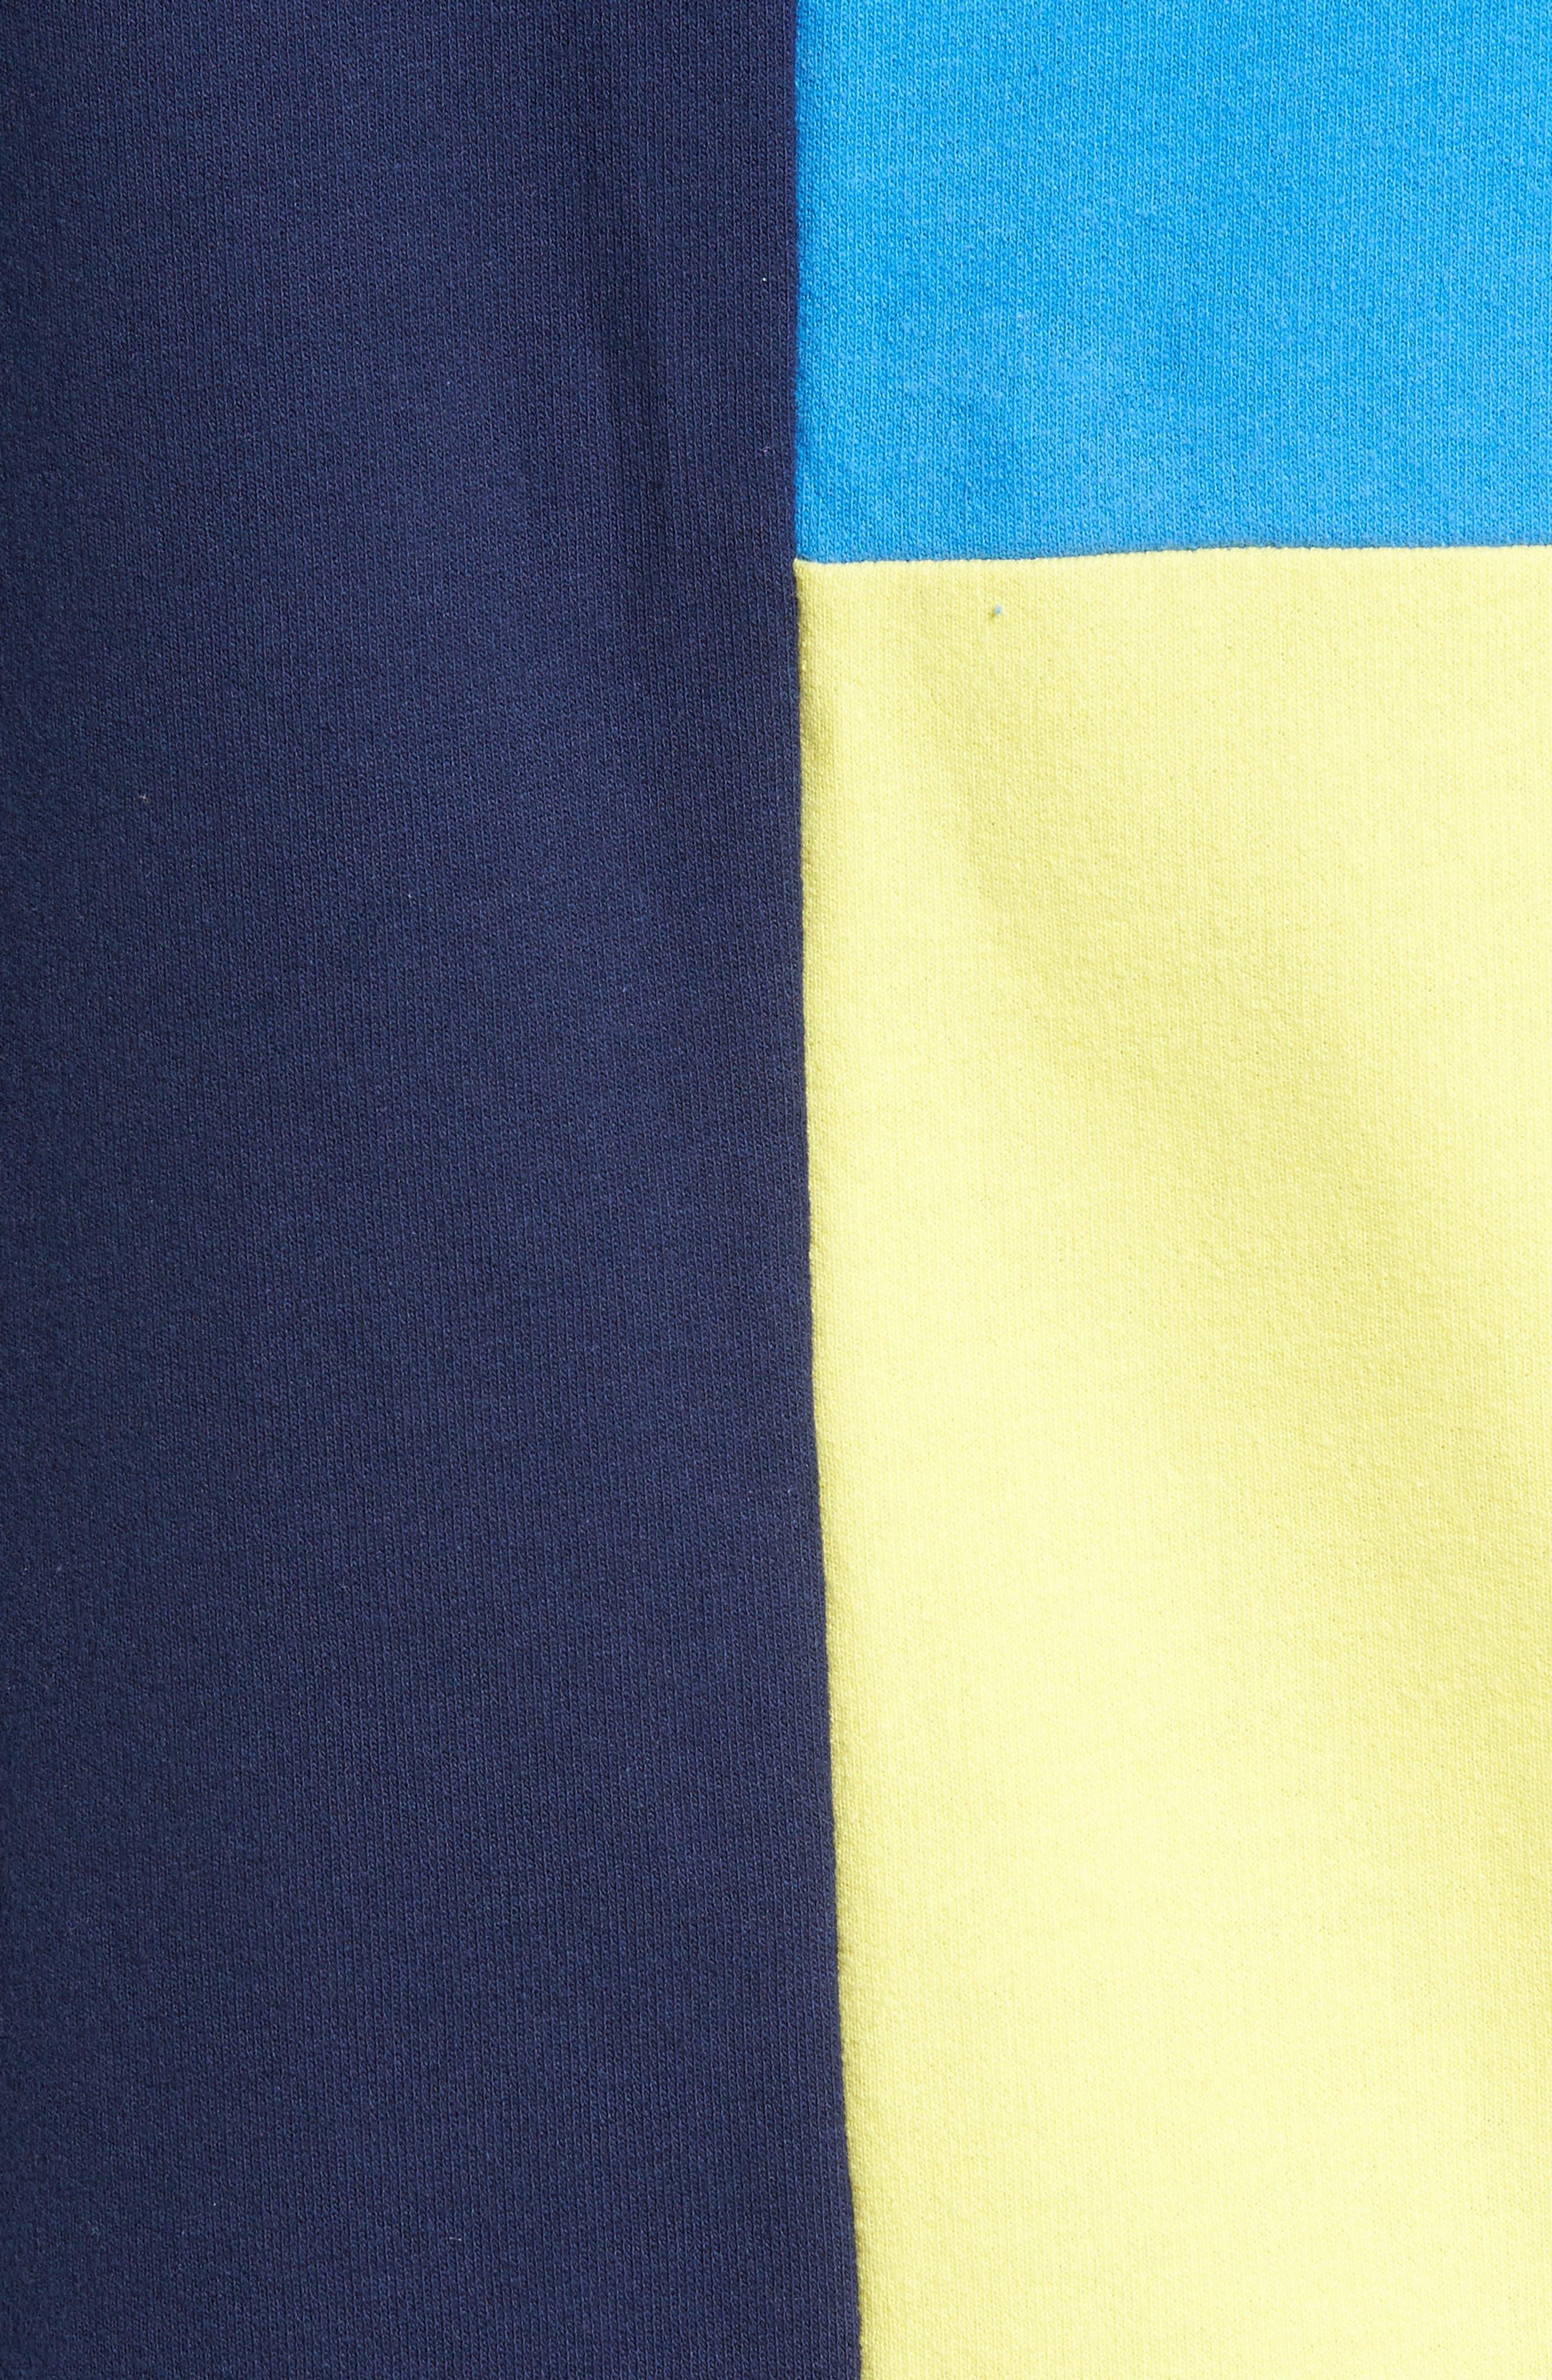 Colorblock Hoodie Sweatshirt,                             Alternate thumbnail 5, color,                             Navy Blue Yellow Block